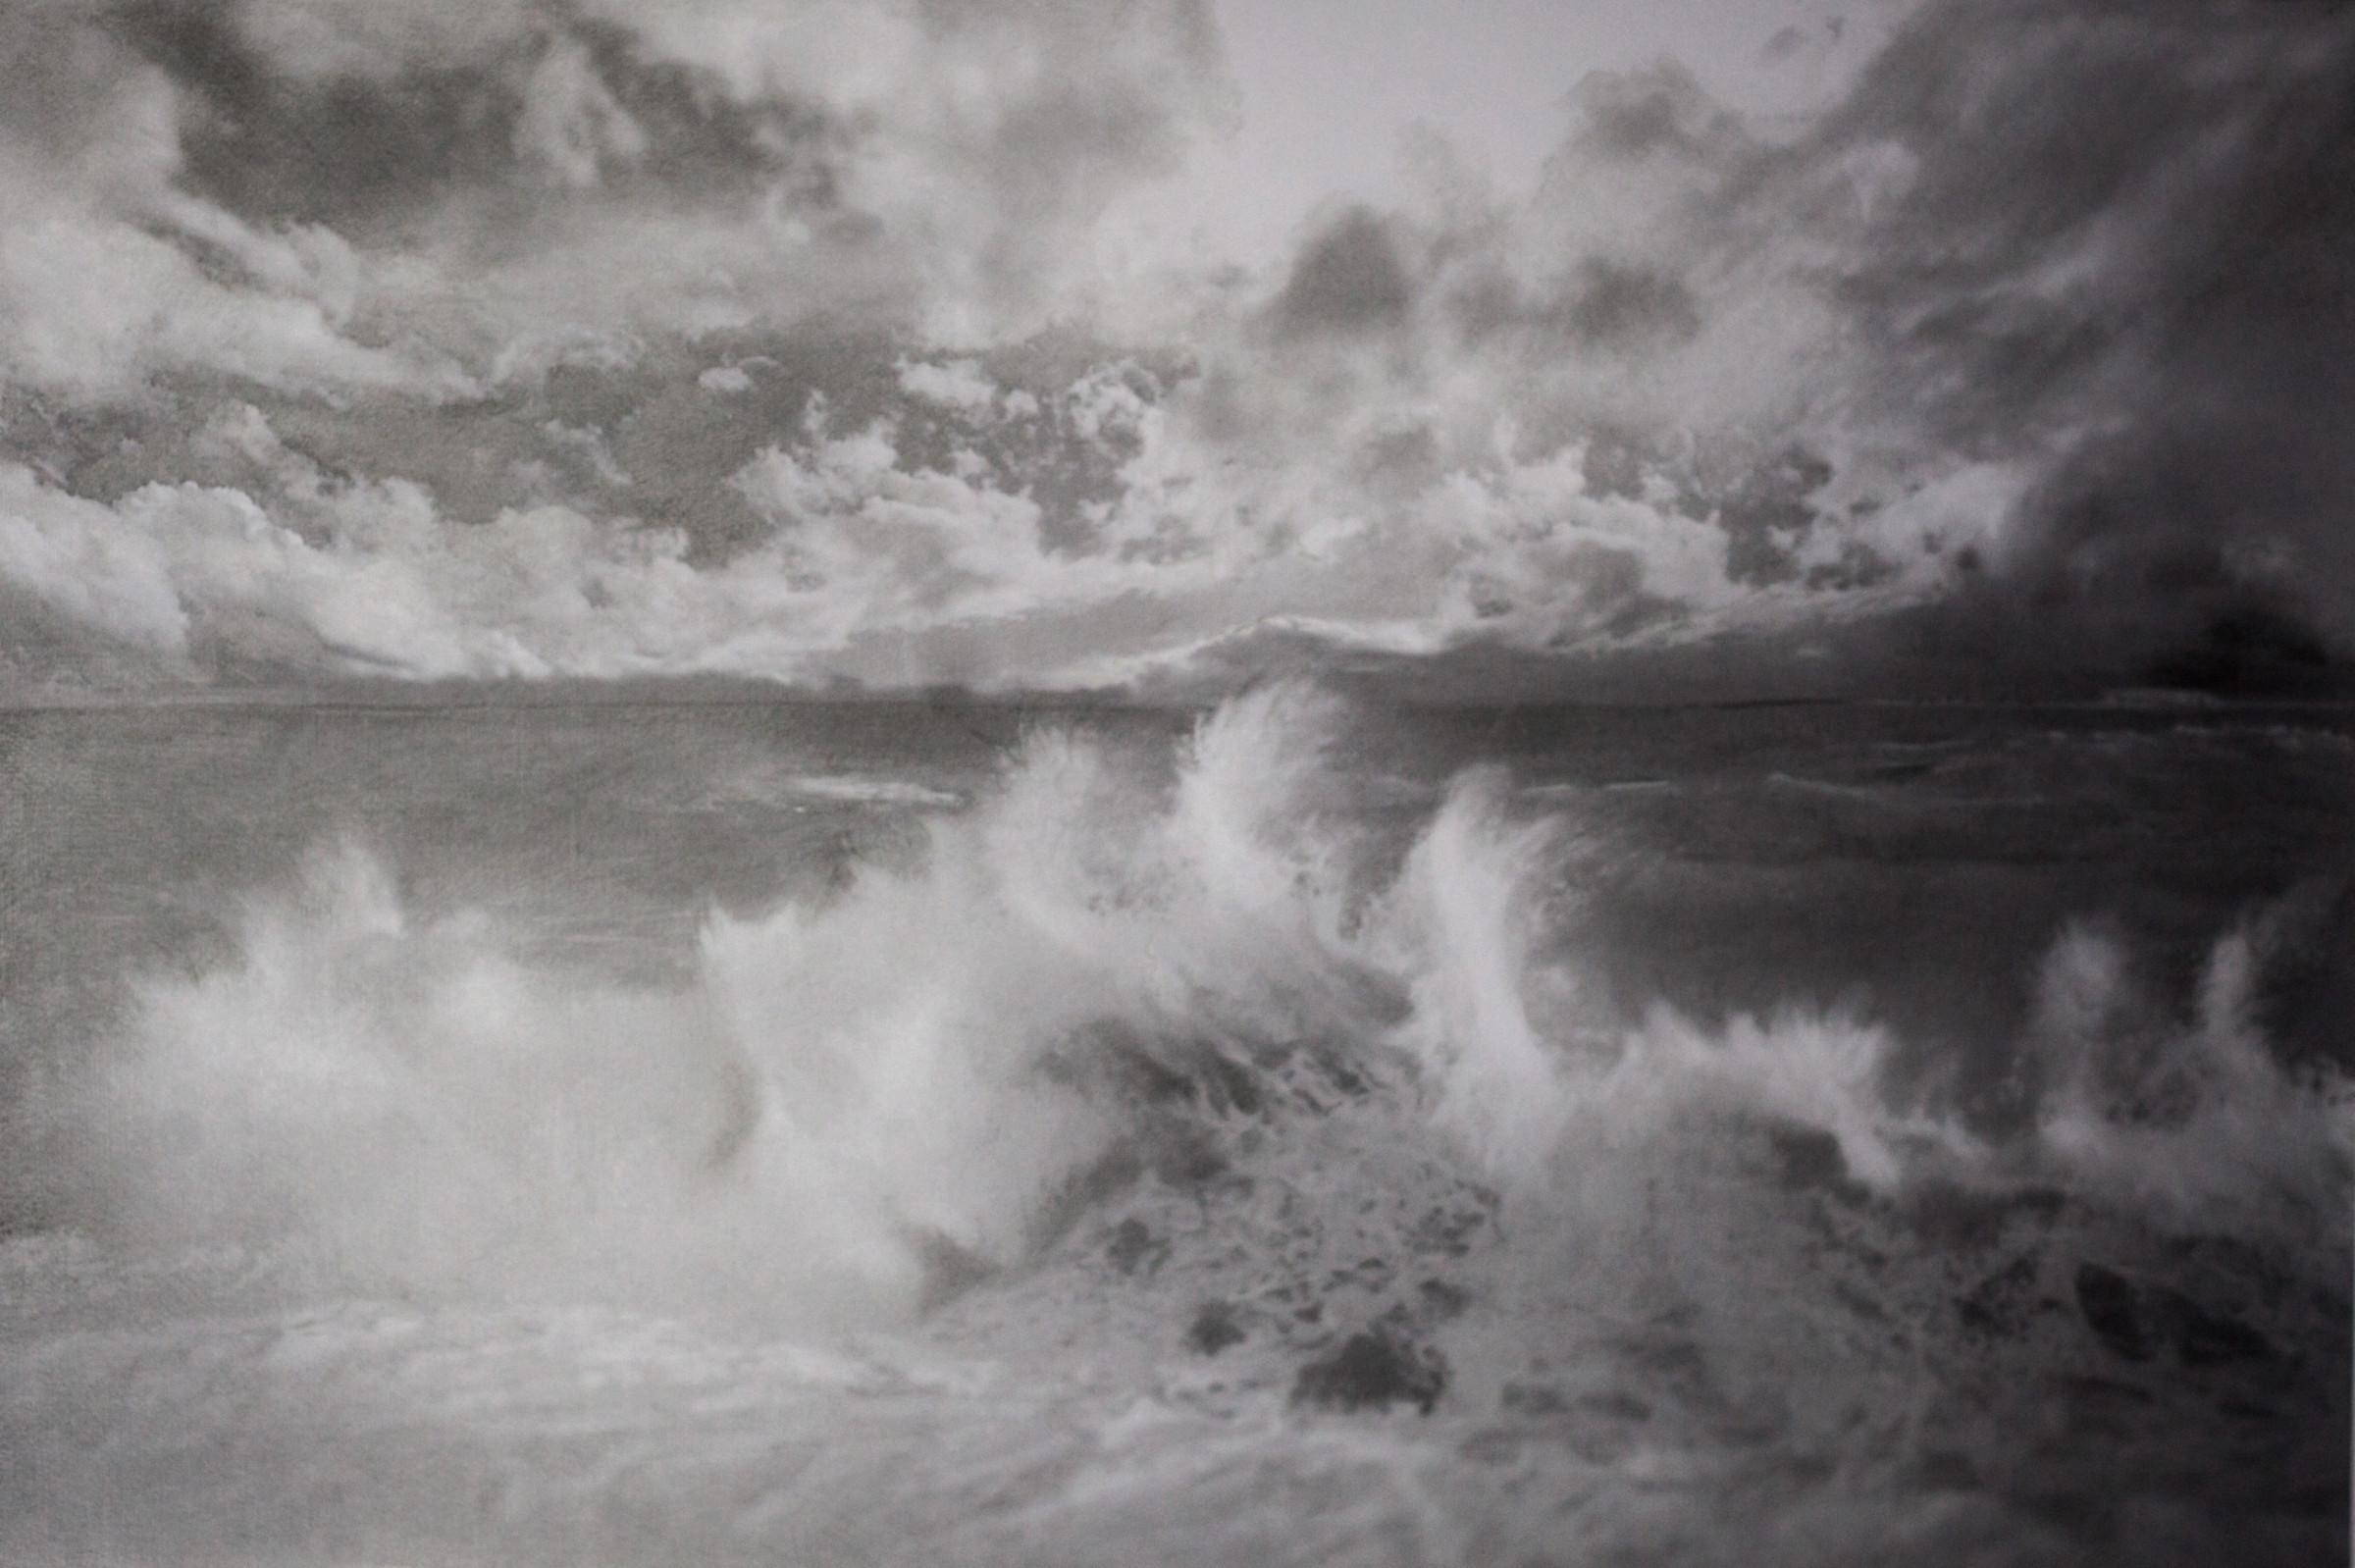 <span class=&#34;link fancybox-details-link&#34;><a href=&#34;/artists/77-paul-cadden/works/2541/&#34;>View Detail Page</a></span><div class=&#34;artist&#34;><strong>Paul Cadden</strong></div> <div class=&#34;title&#34;><em>Northern Sky</em></div> <div class=&#34;medium&#34;>Pencil on paper</div> <div class=&#34;dimensions&#34;>49 x 74 cm</div><div class=&#34;copyright_line&#34;>Copyright The Artist</div>